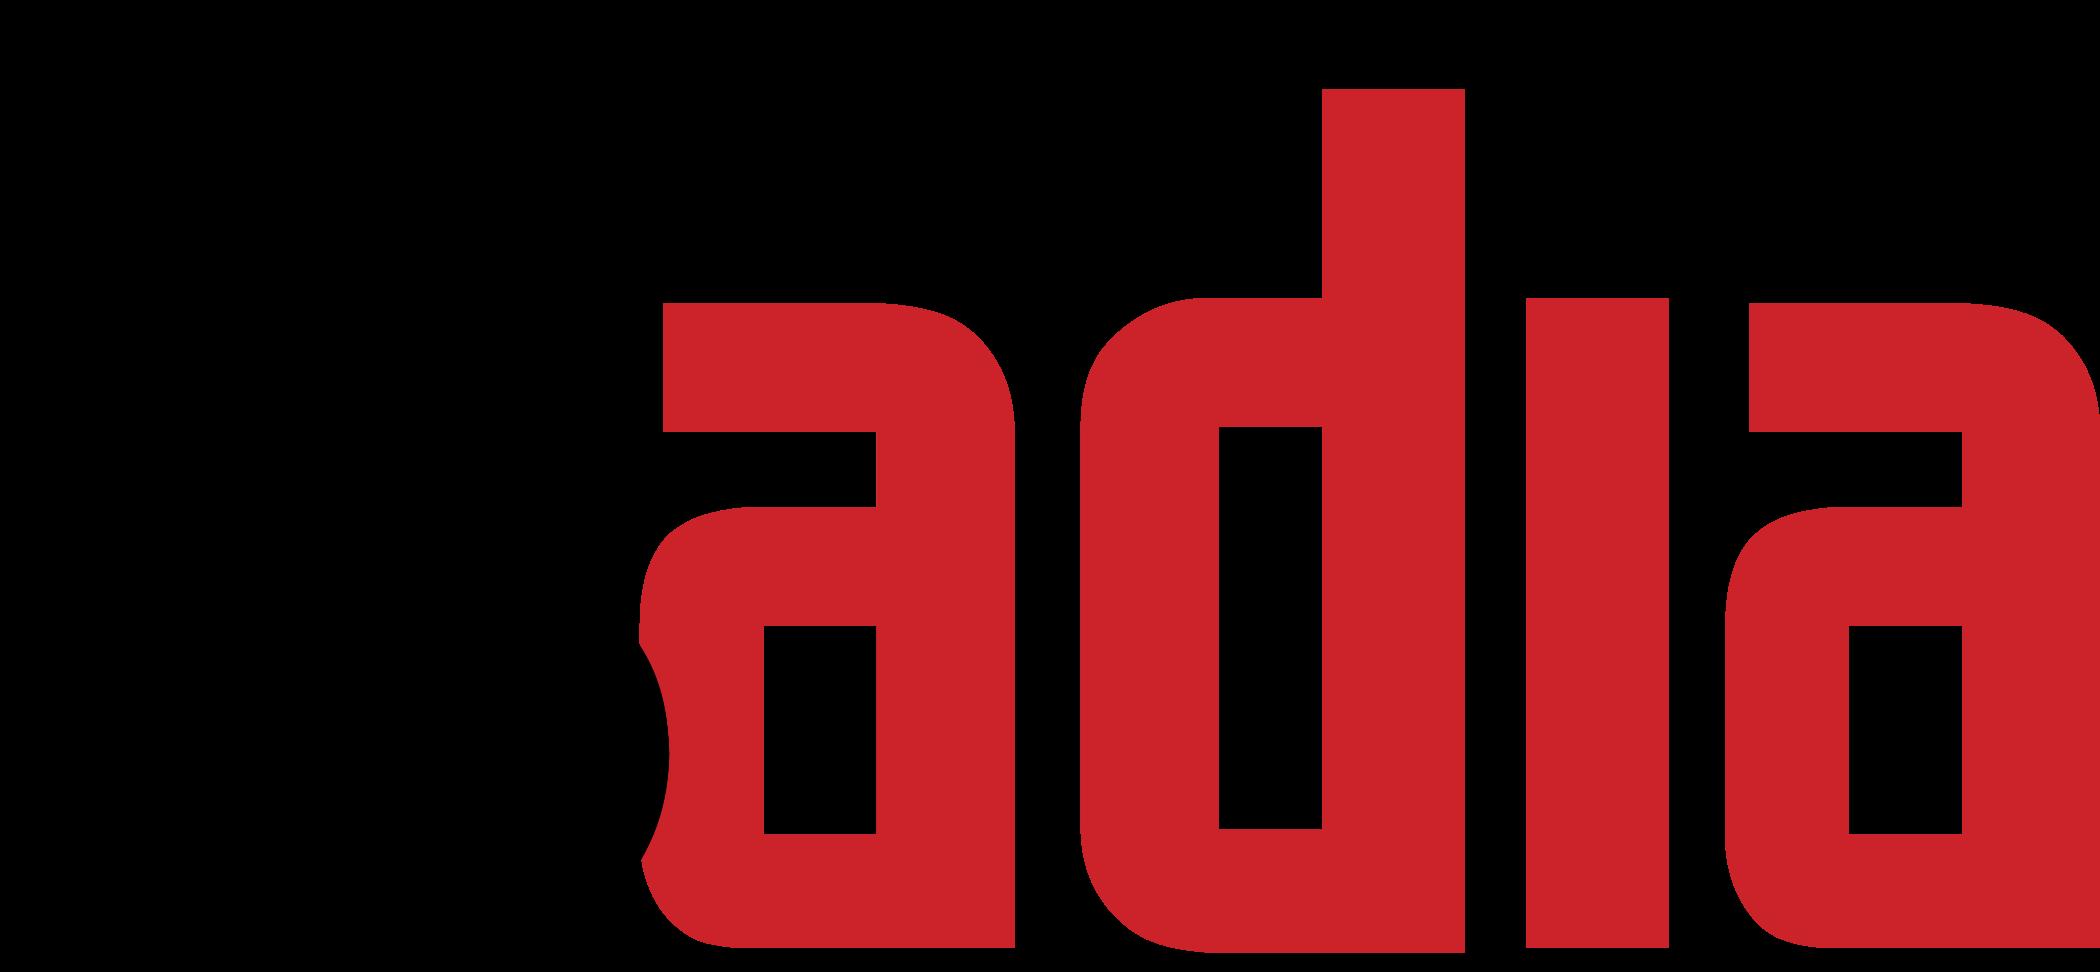 sadia logo 2 - Sadia Logo